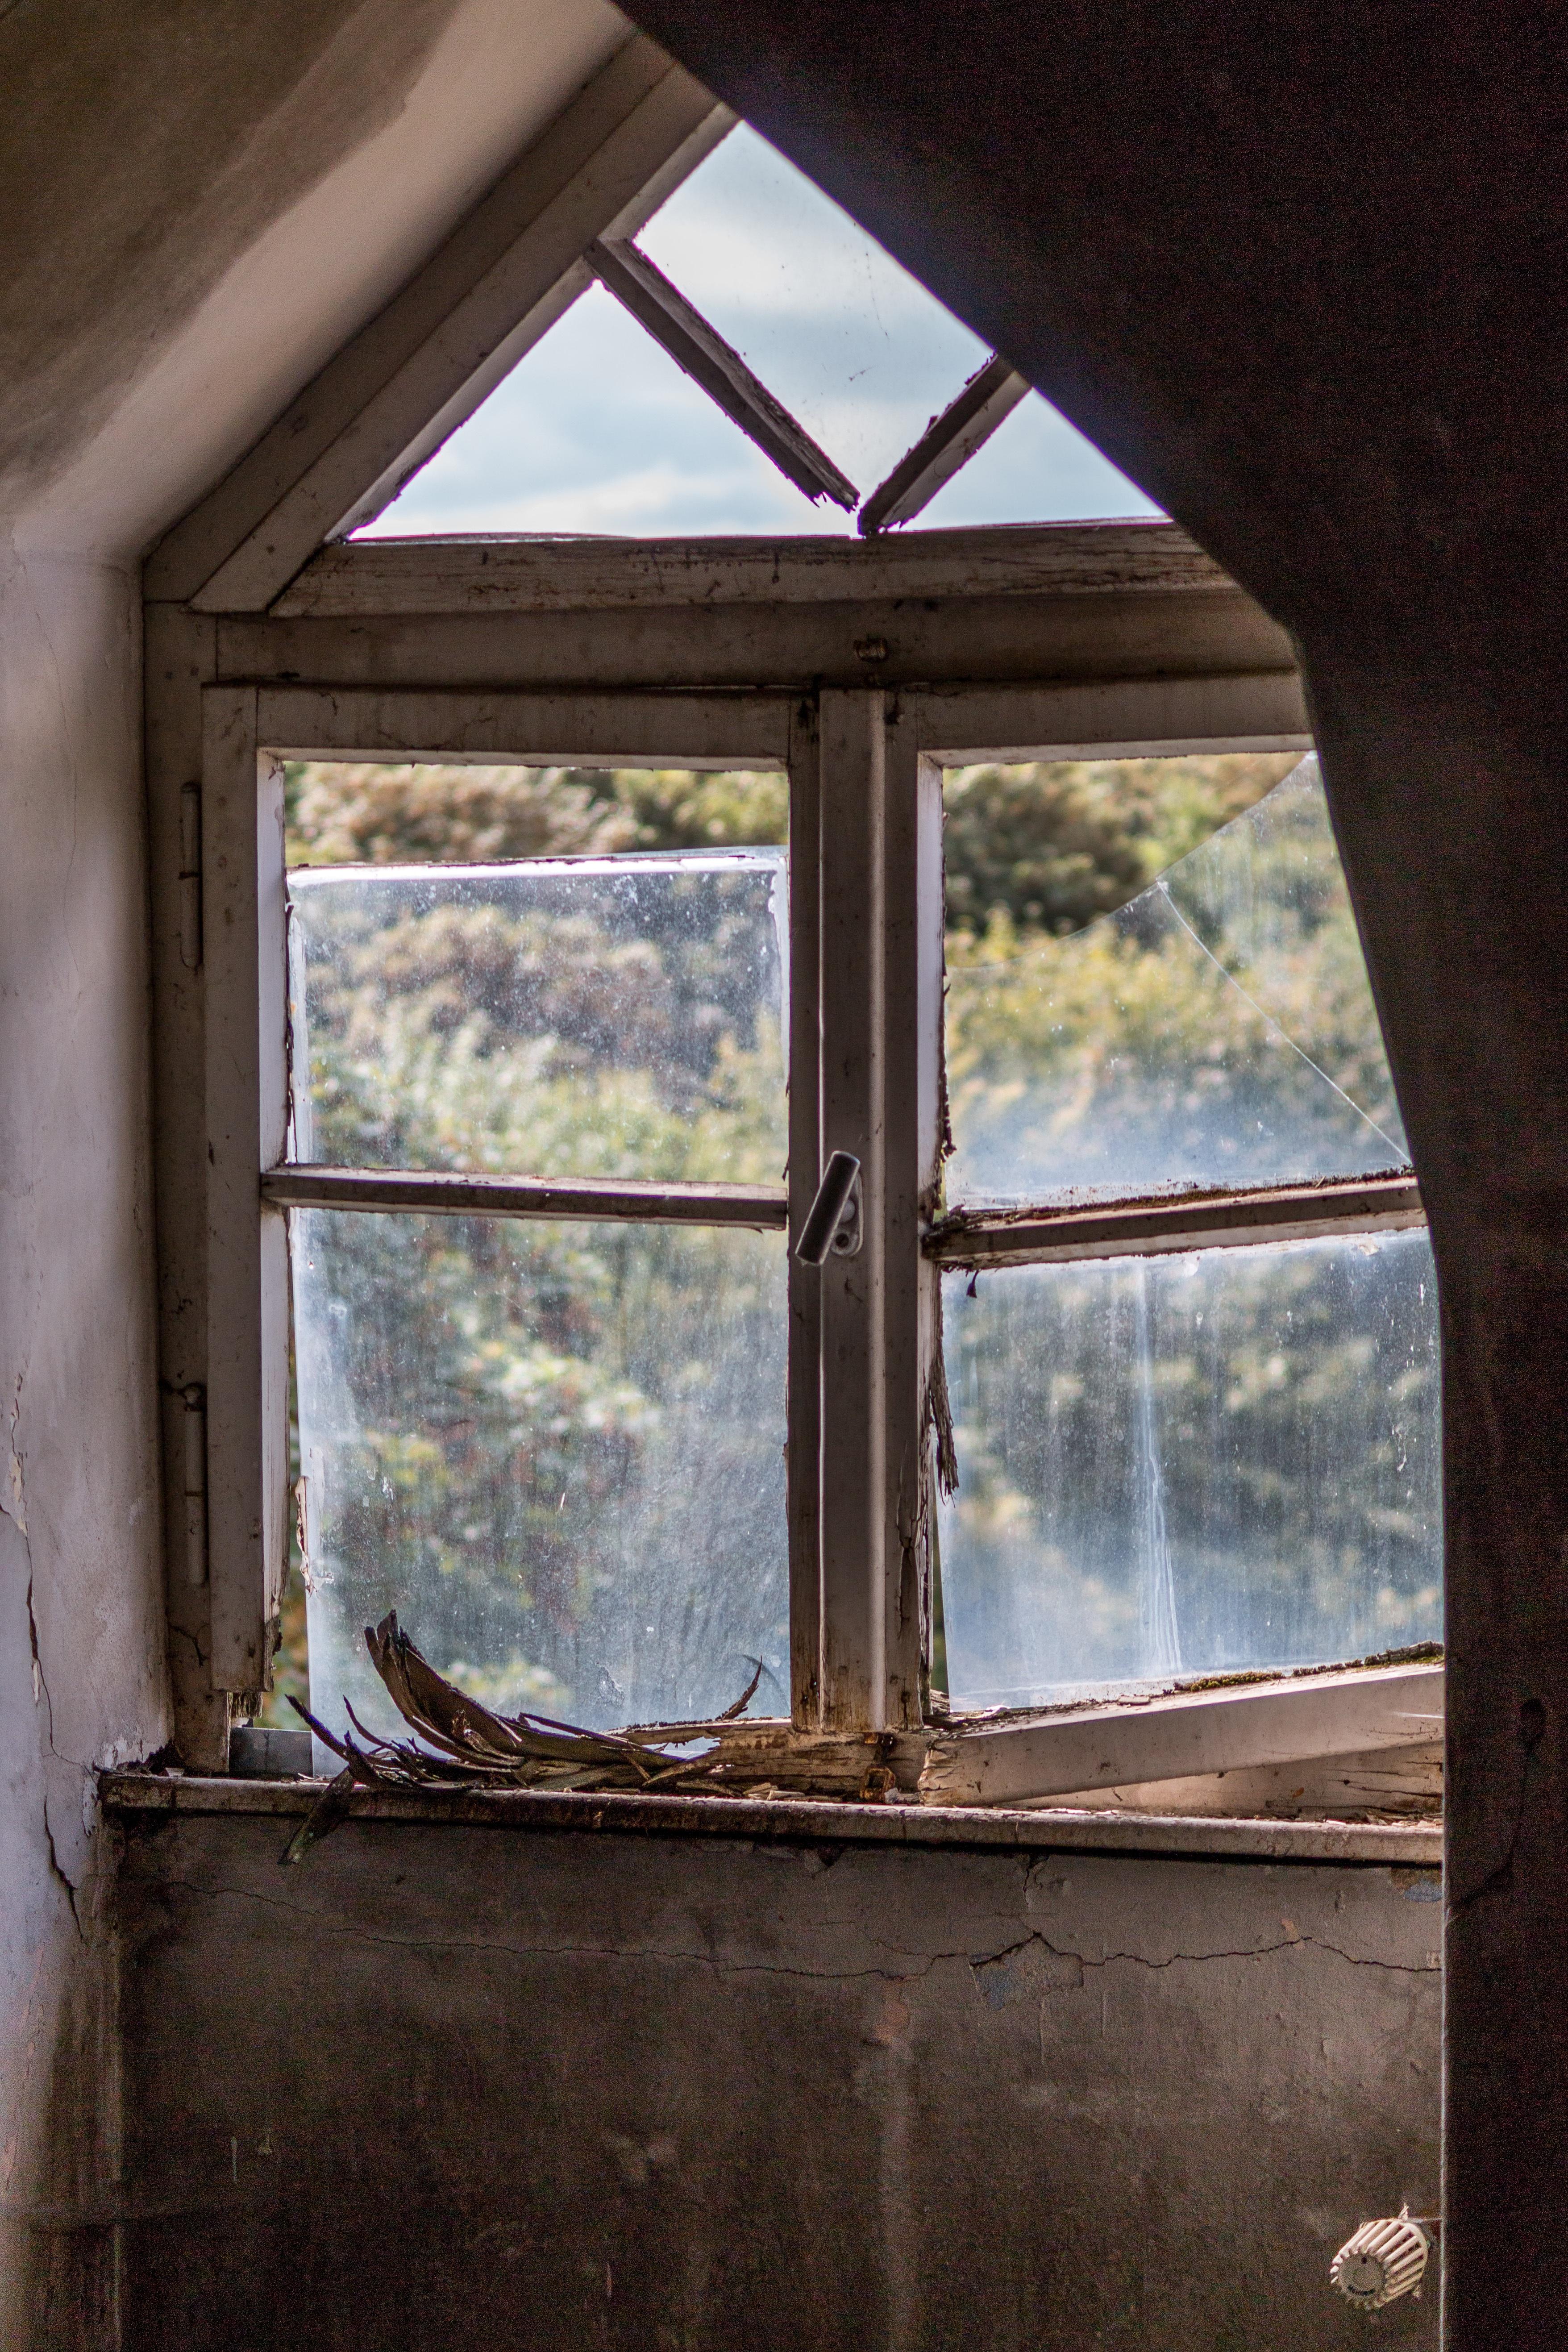 Gratis Afbeeldingen : licht, architectuur, hout, huis, venster ...